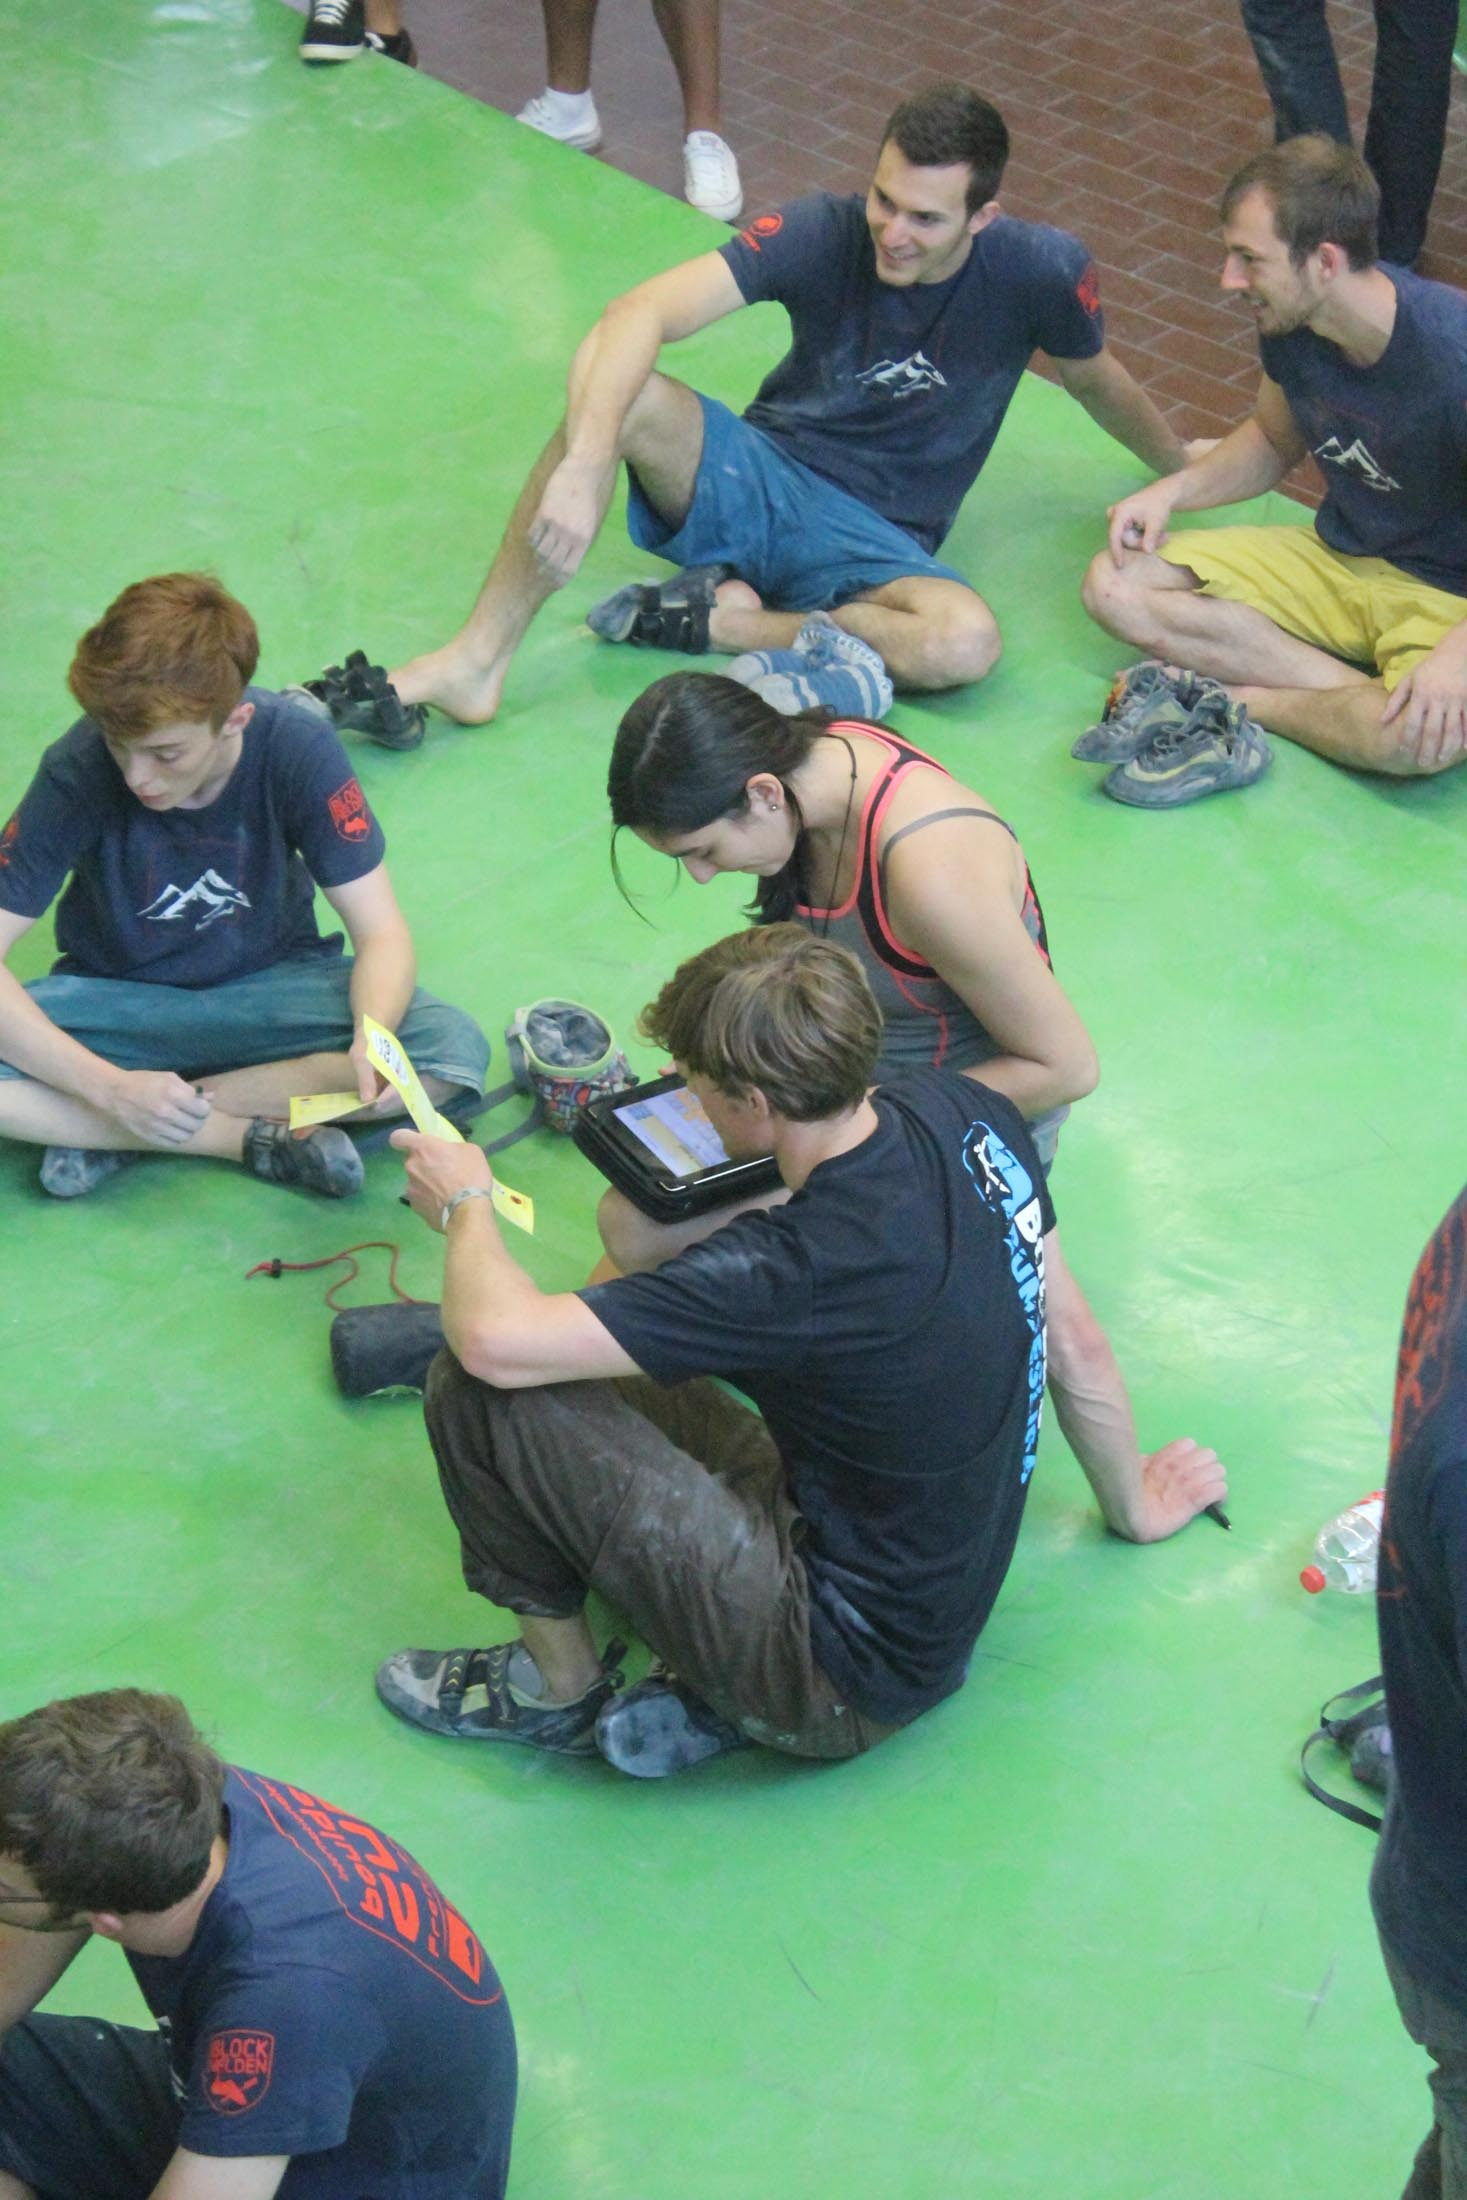 Quali, internationaler bouldercup Frankenjura 2016, BLOCKHELDEN Erlangen, Mammut, Bergfreunde.de, Boulderwettkampf07092016296